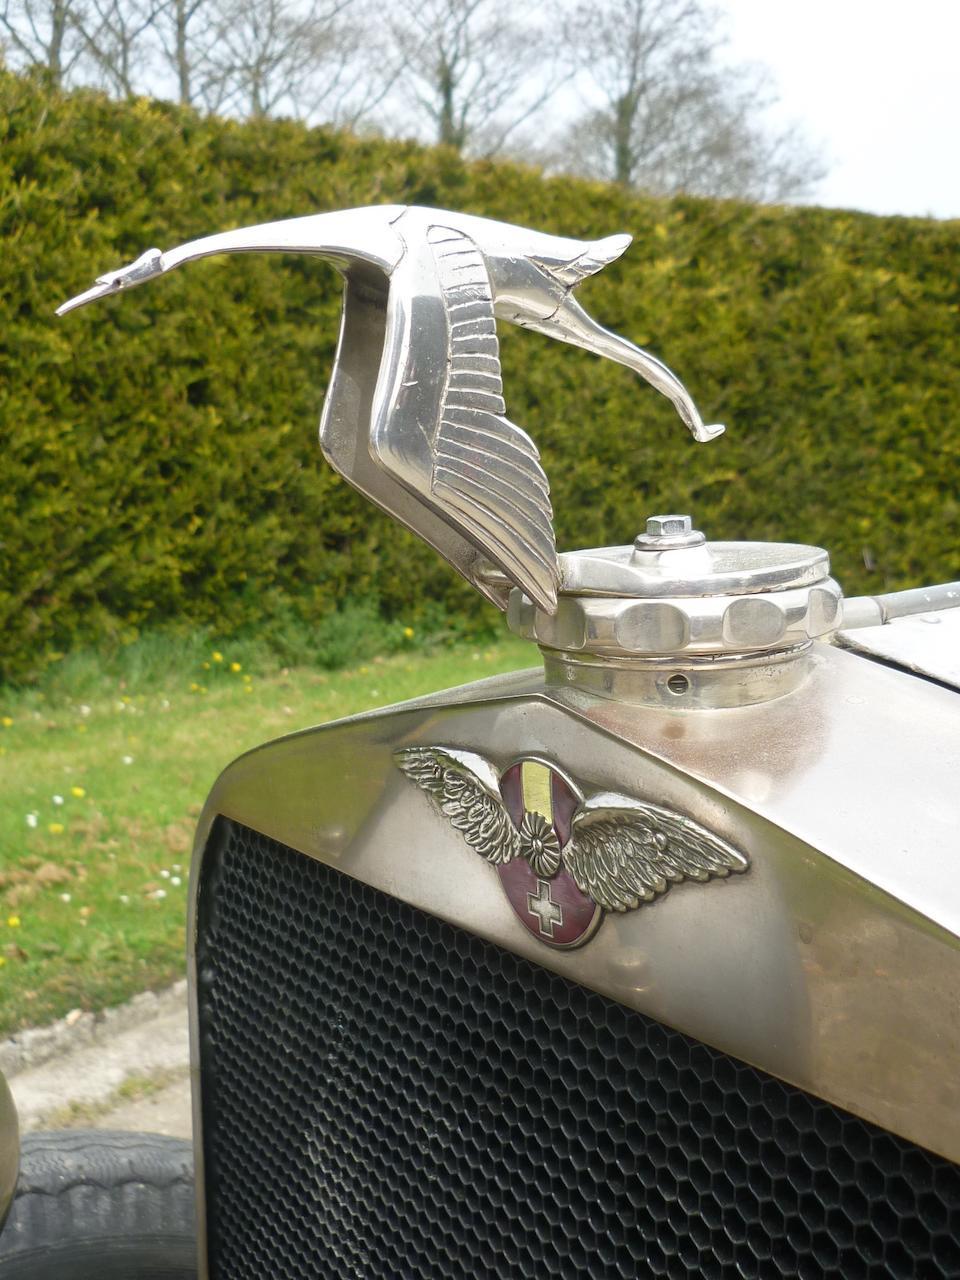 c.1925 Hispano-Suiza 20CV I6 Project  Chassis no. 20004